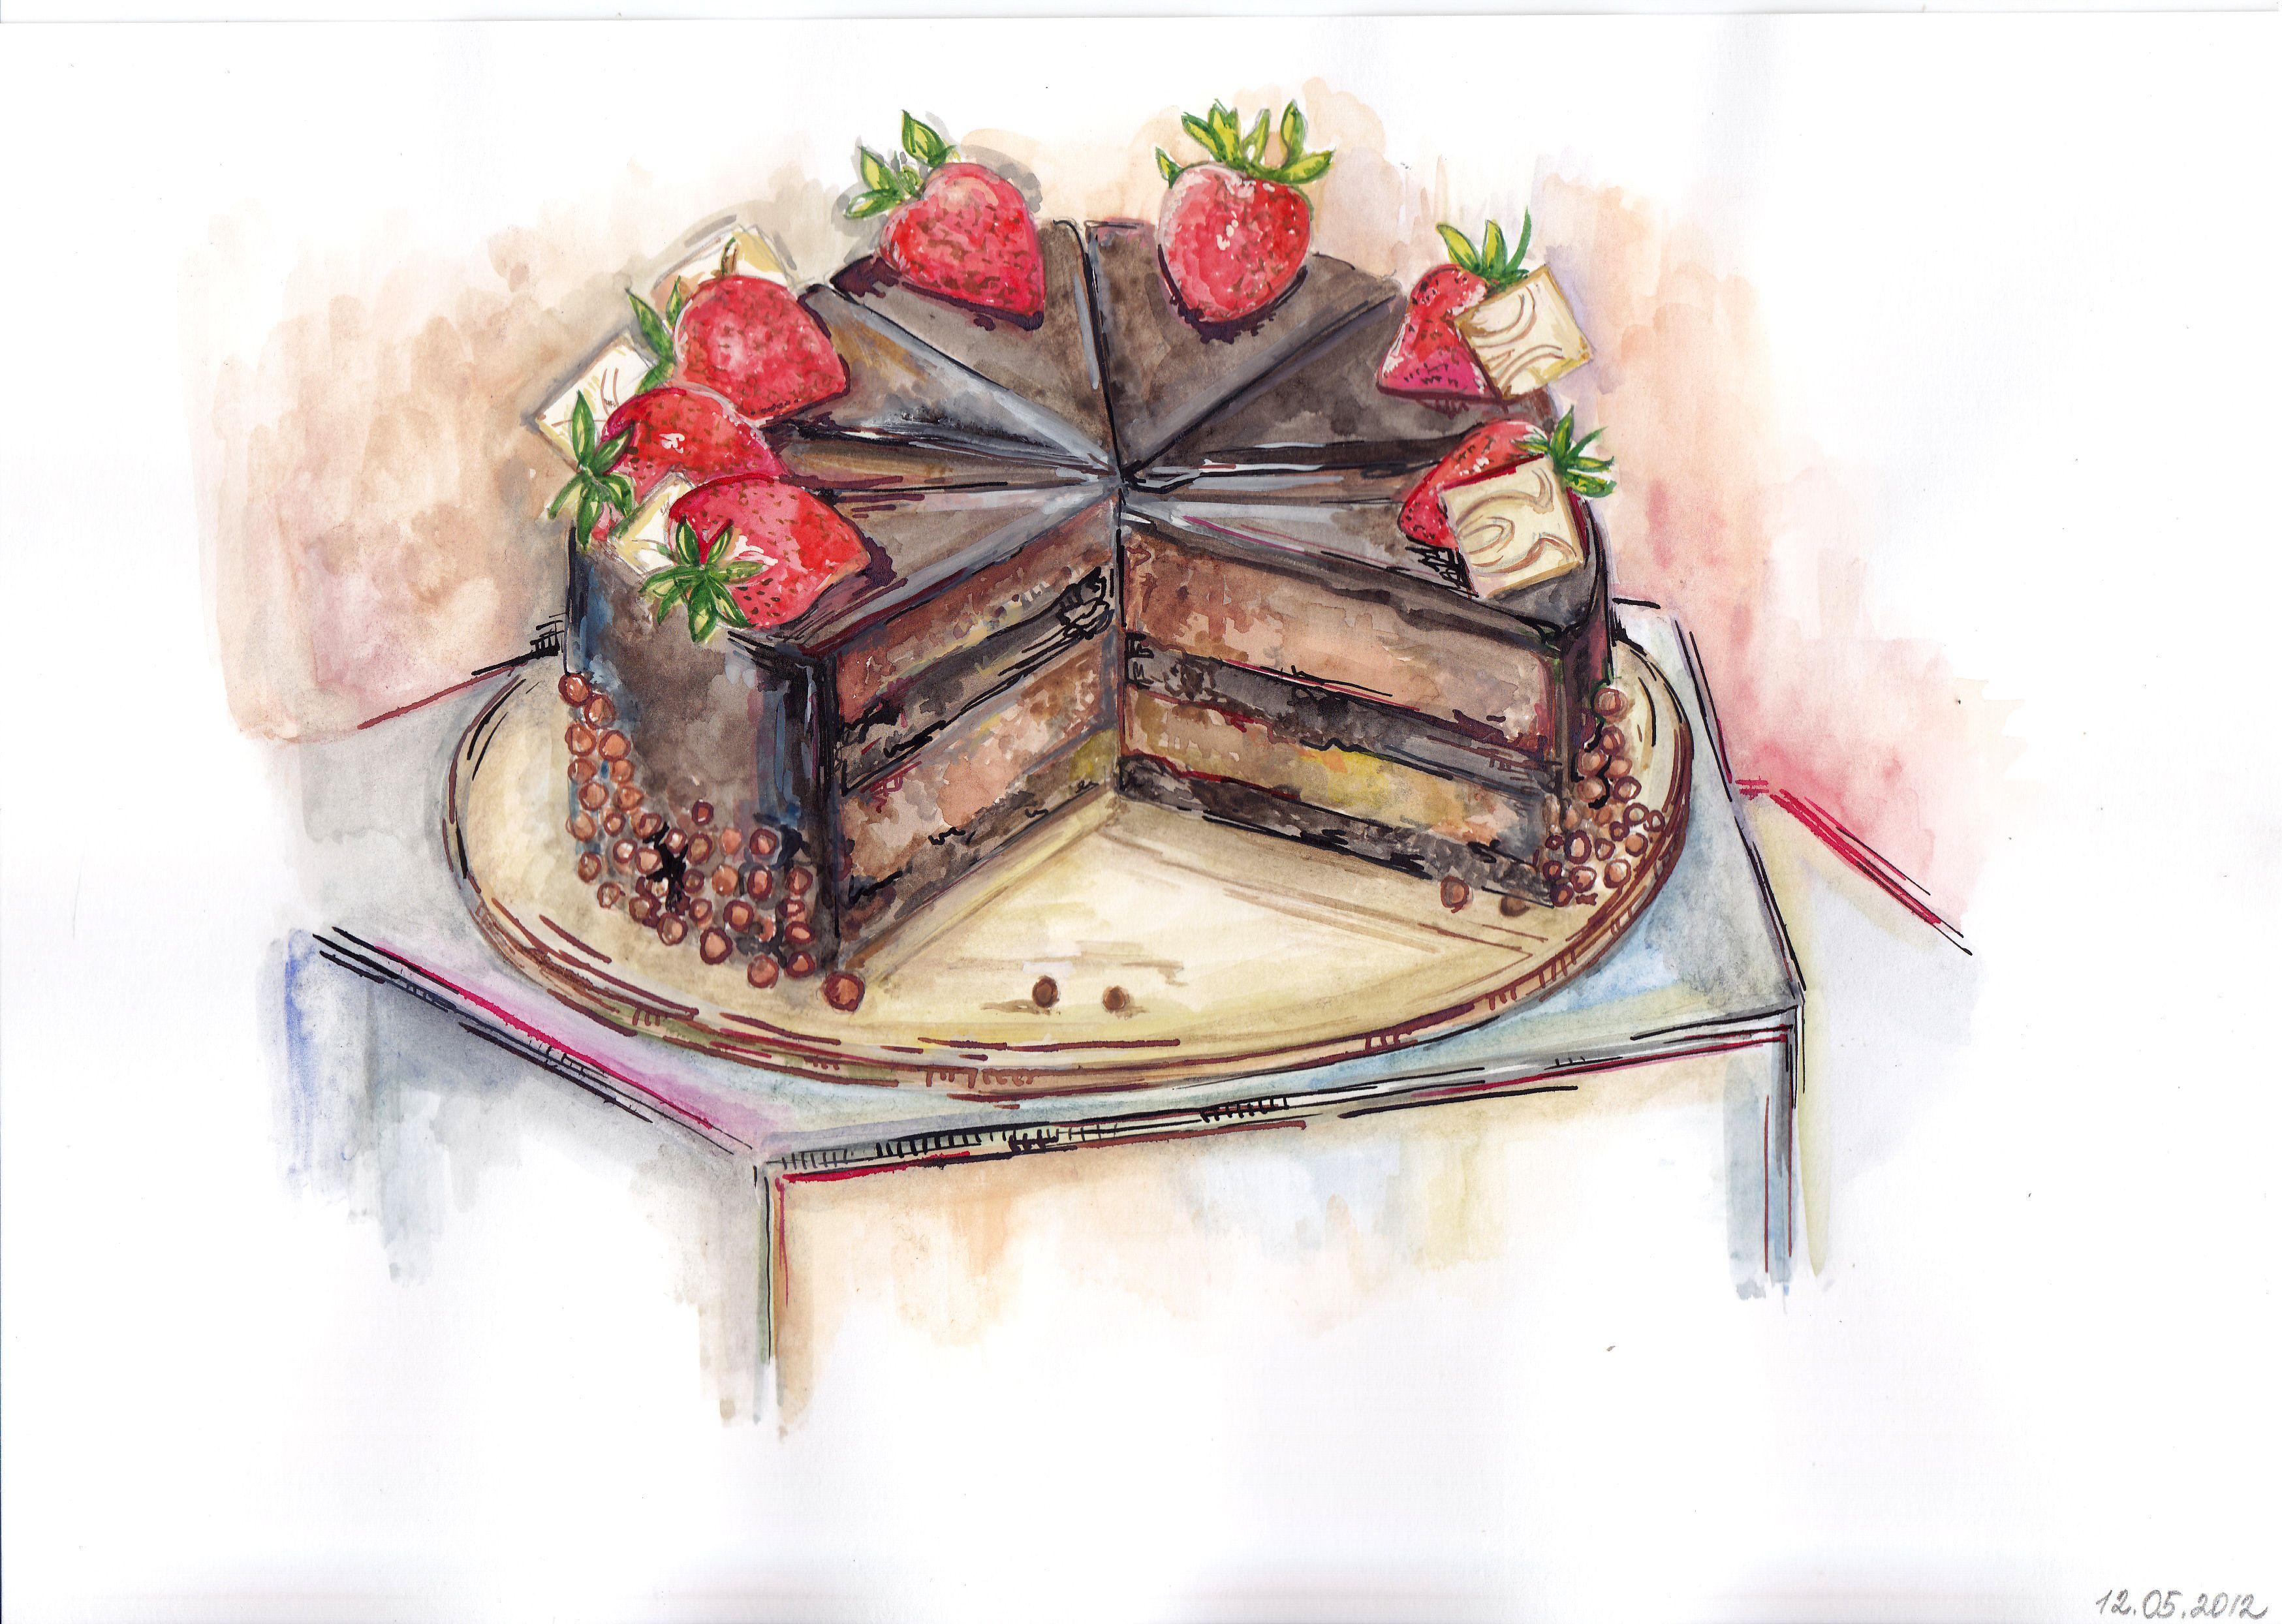 Food Painting Dessert Art Baking Illustration Kitchen Wall Art Funfetti Cake Art Print Pink Frosted Cake Painting Slice of Cake Print